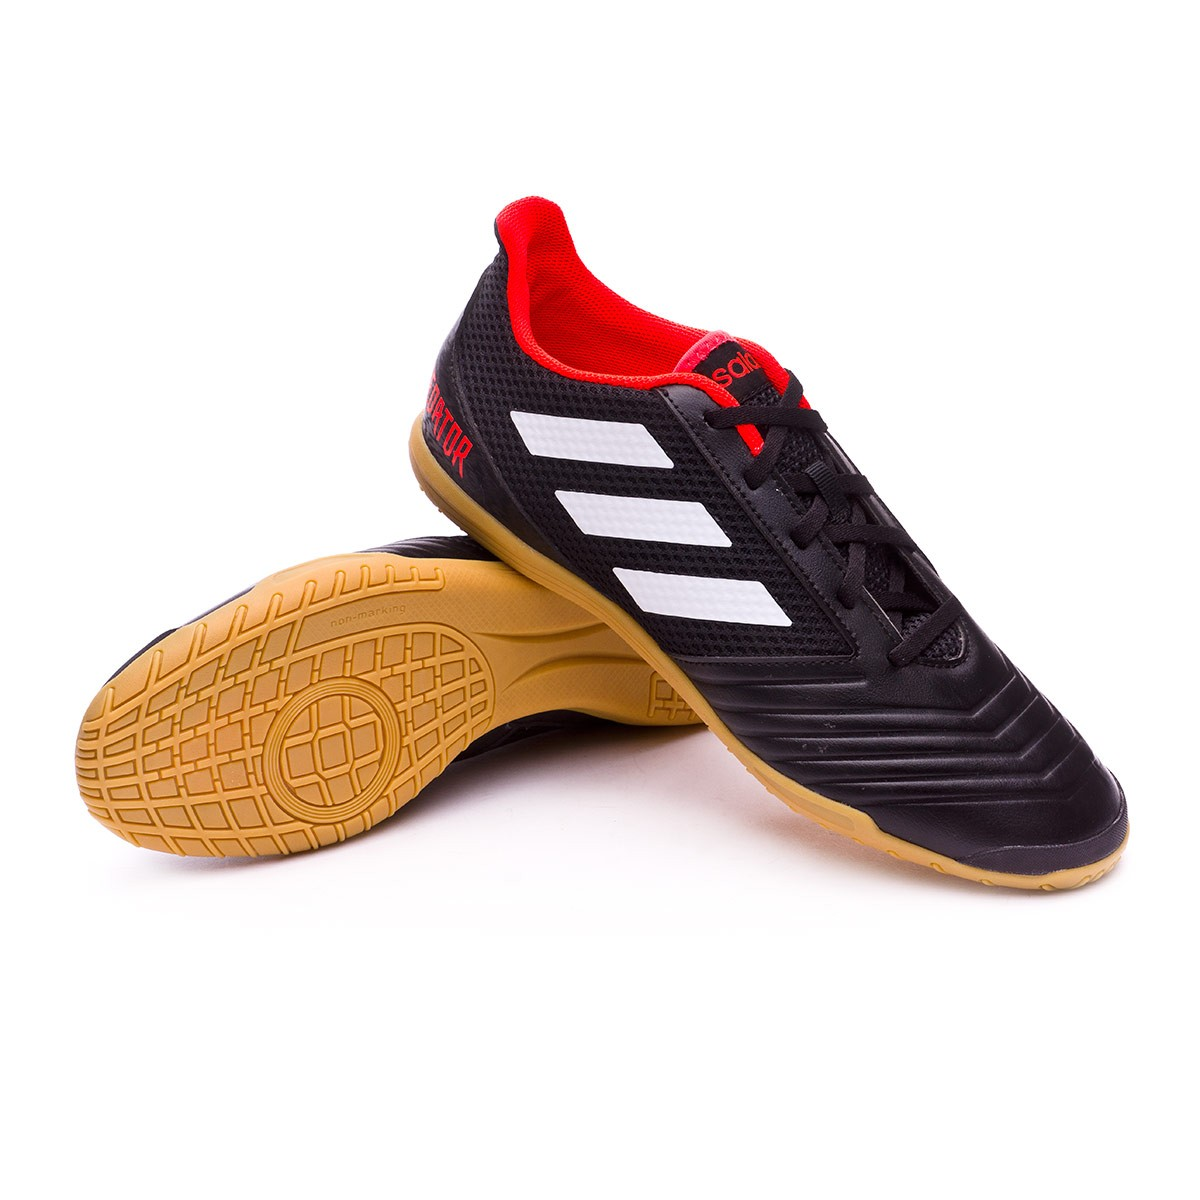 623581983ae24 Tenis adidas Predator Tango 18.4 Sala White-Core black-Real coral - Tienda  de fútbol Fútbol Emotion